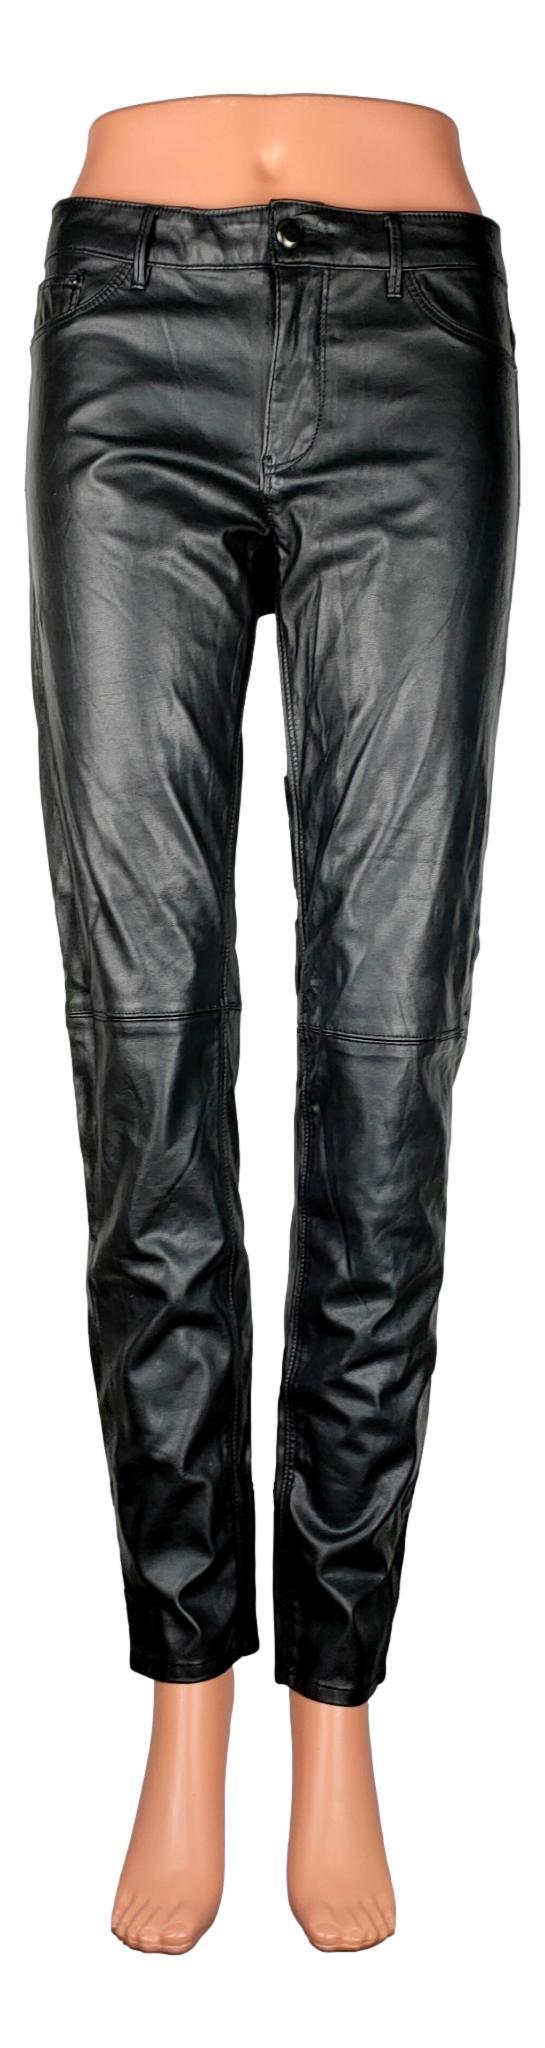 Pantalon H&M - Taille 38